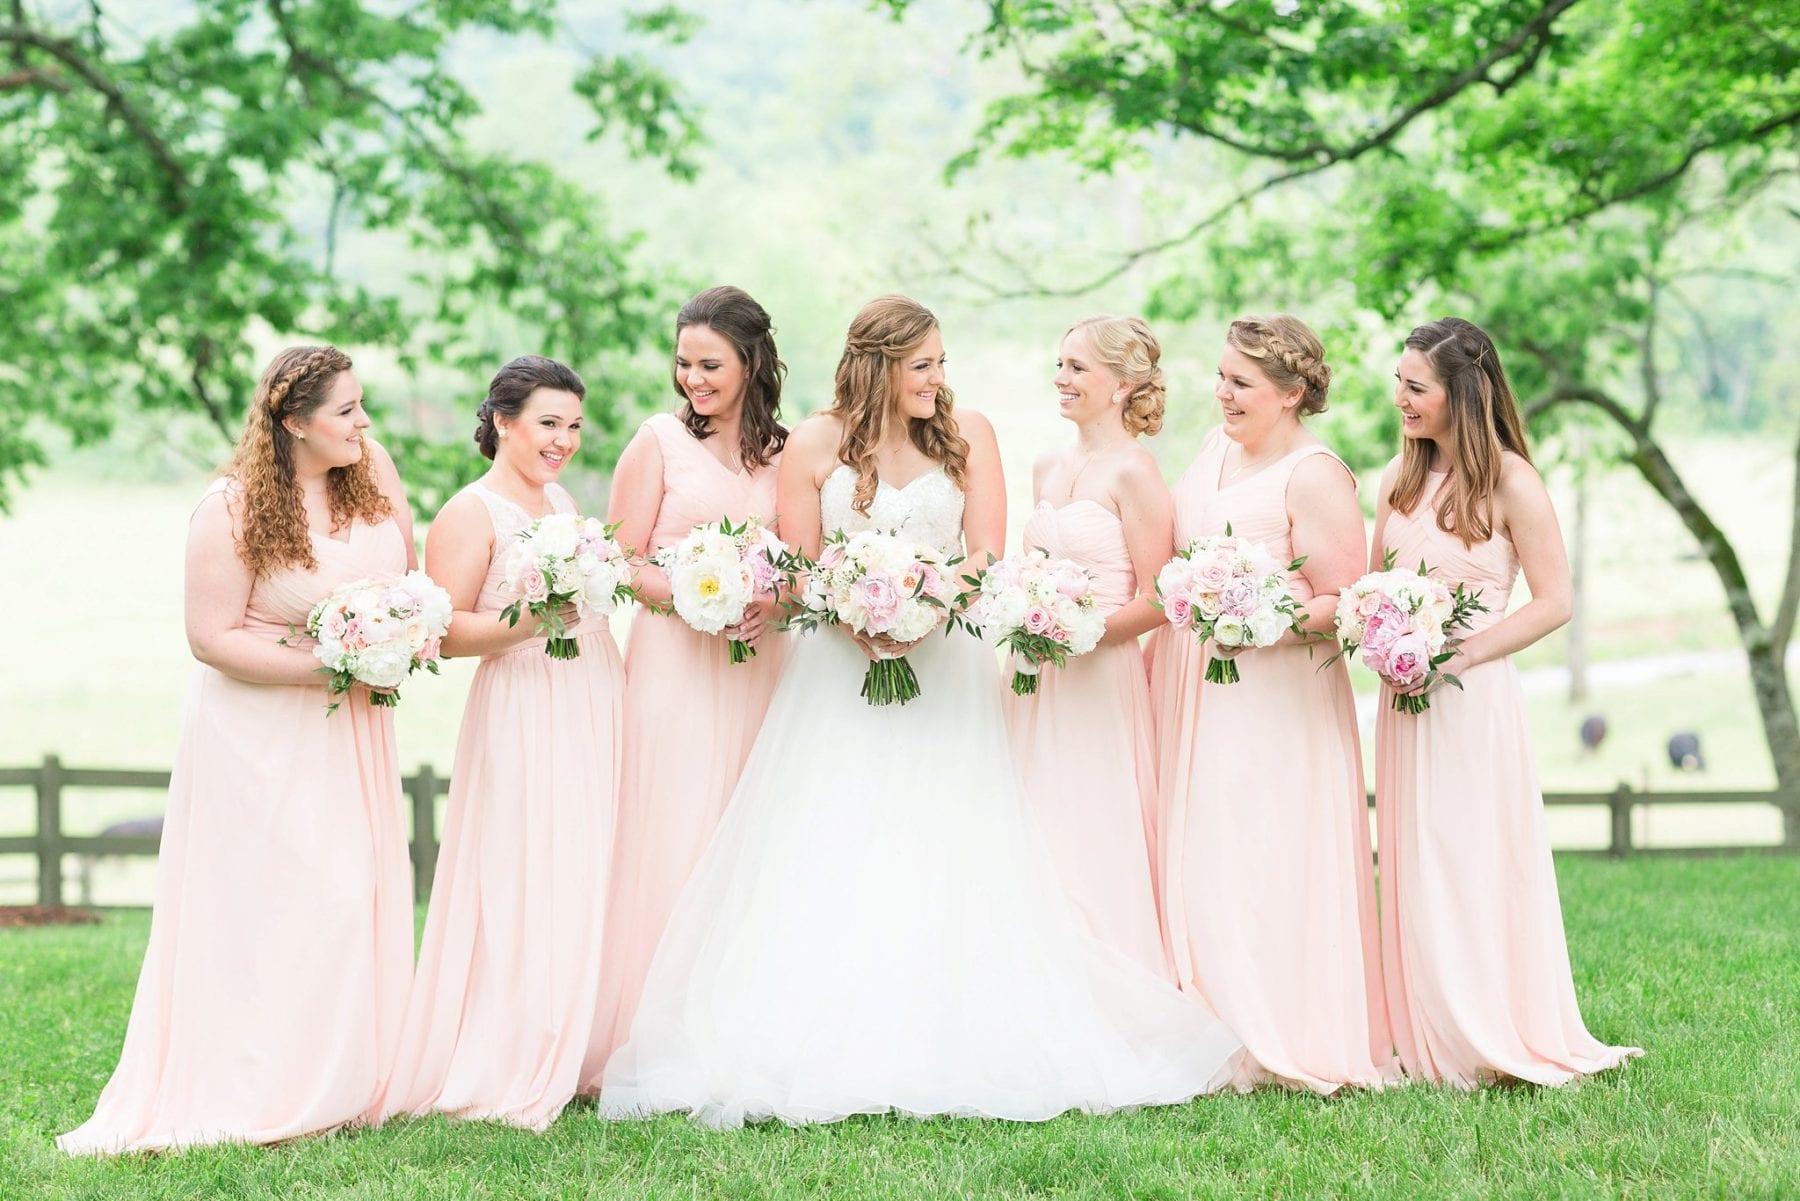 Justin & Megan Big Spring Farm Wedding Photos-150.jpg